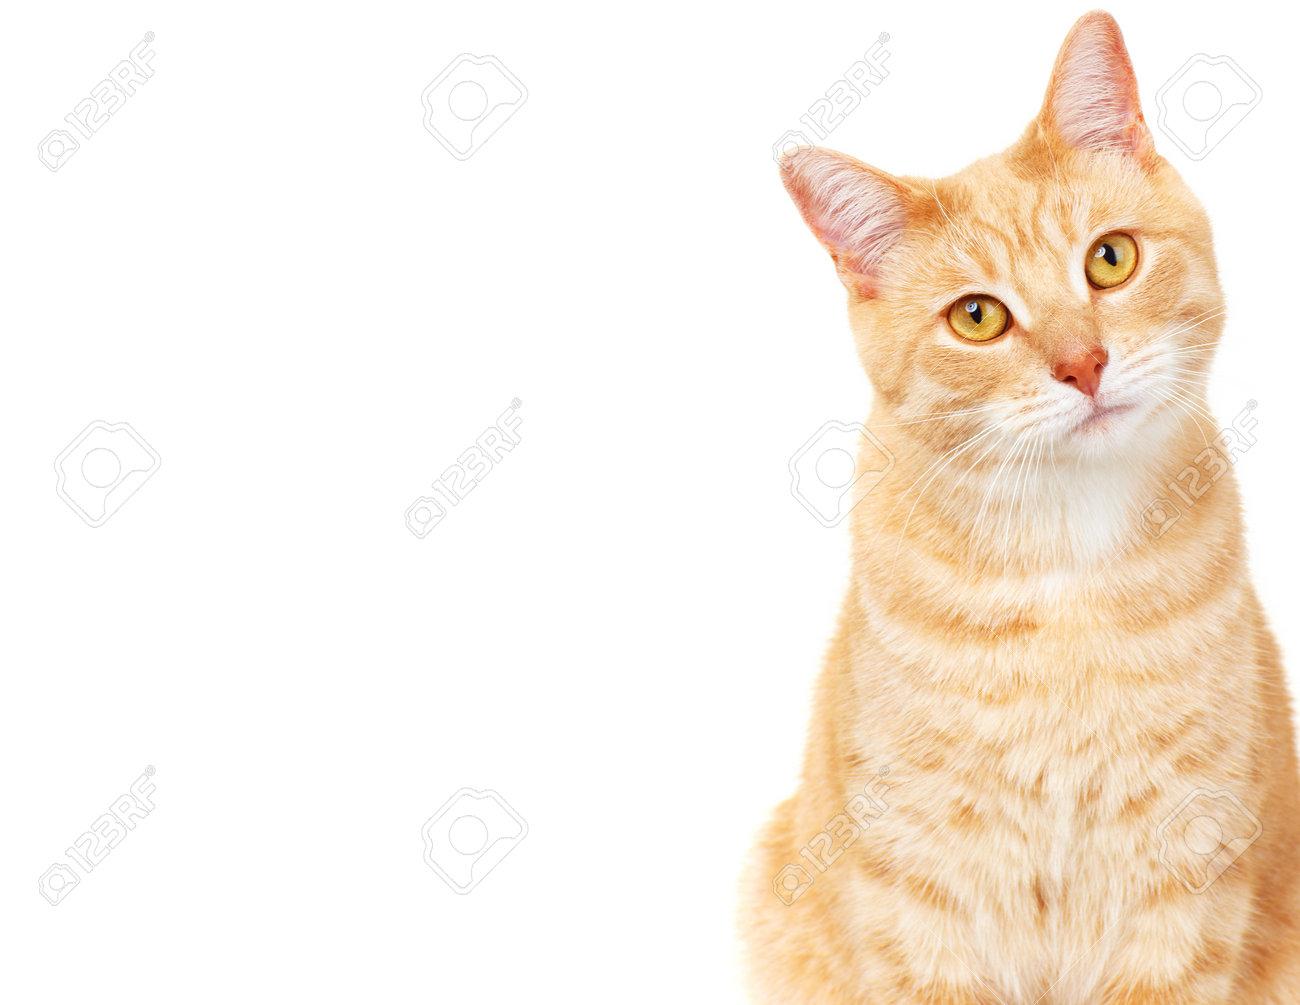 Pet cat Stock Photo - 17315873